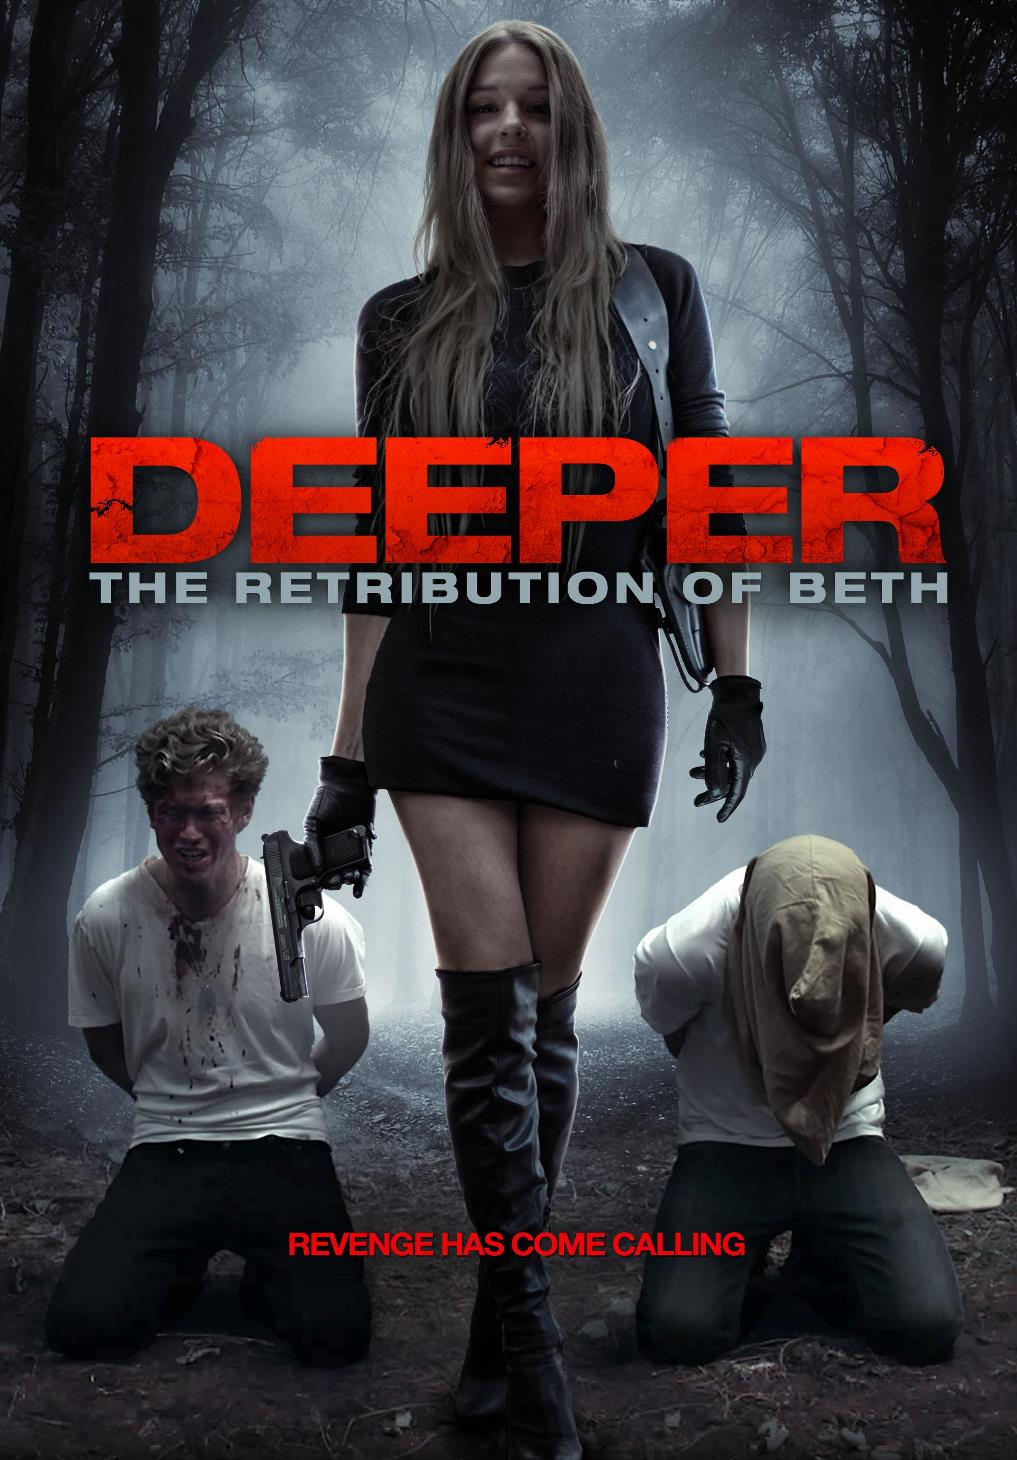 Deeper%20The%20Retribution%20of%20Beth%202014.1 1 دانلود فیلم Deeper: The Retribution of Beth 2014